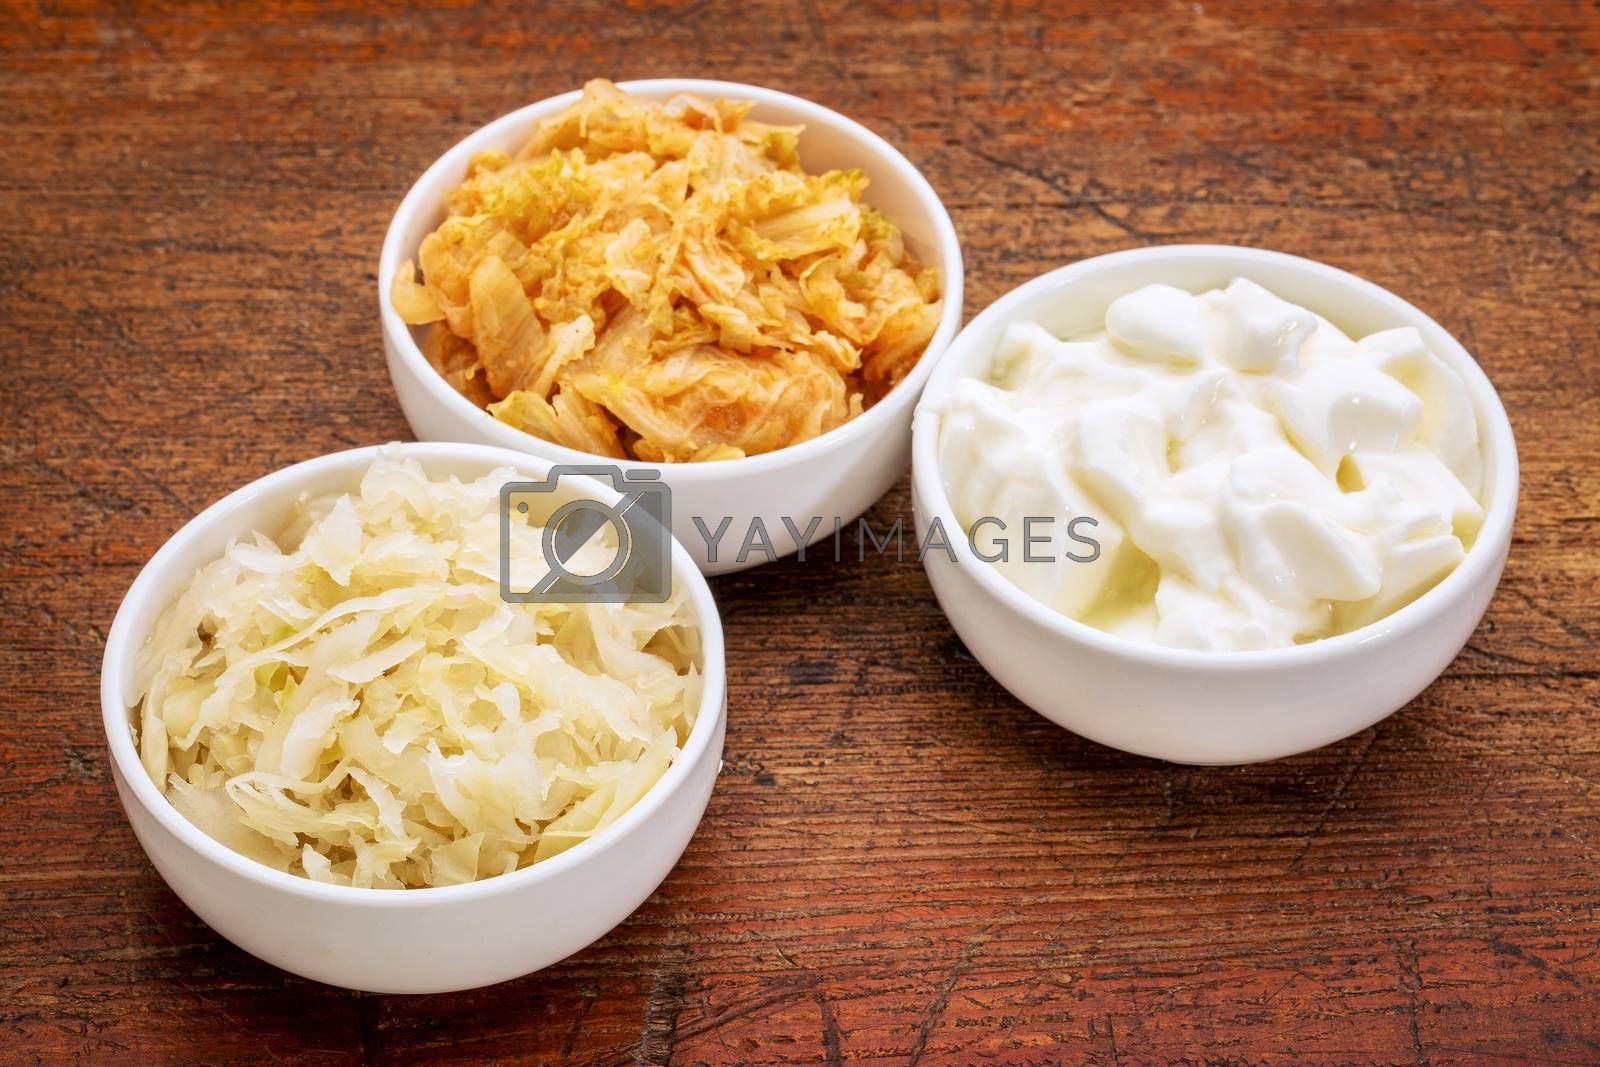 sauerkraut, kimchi and yogurt - popular probiotic fermented food - three ceramic bowl against rustic wood